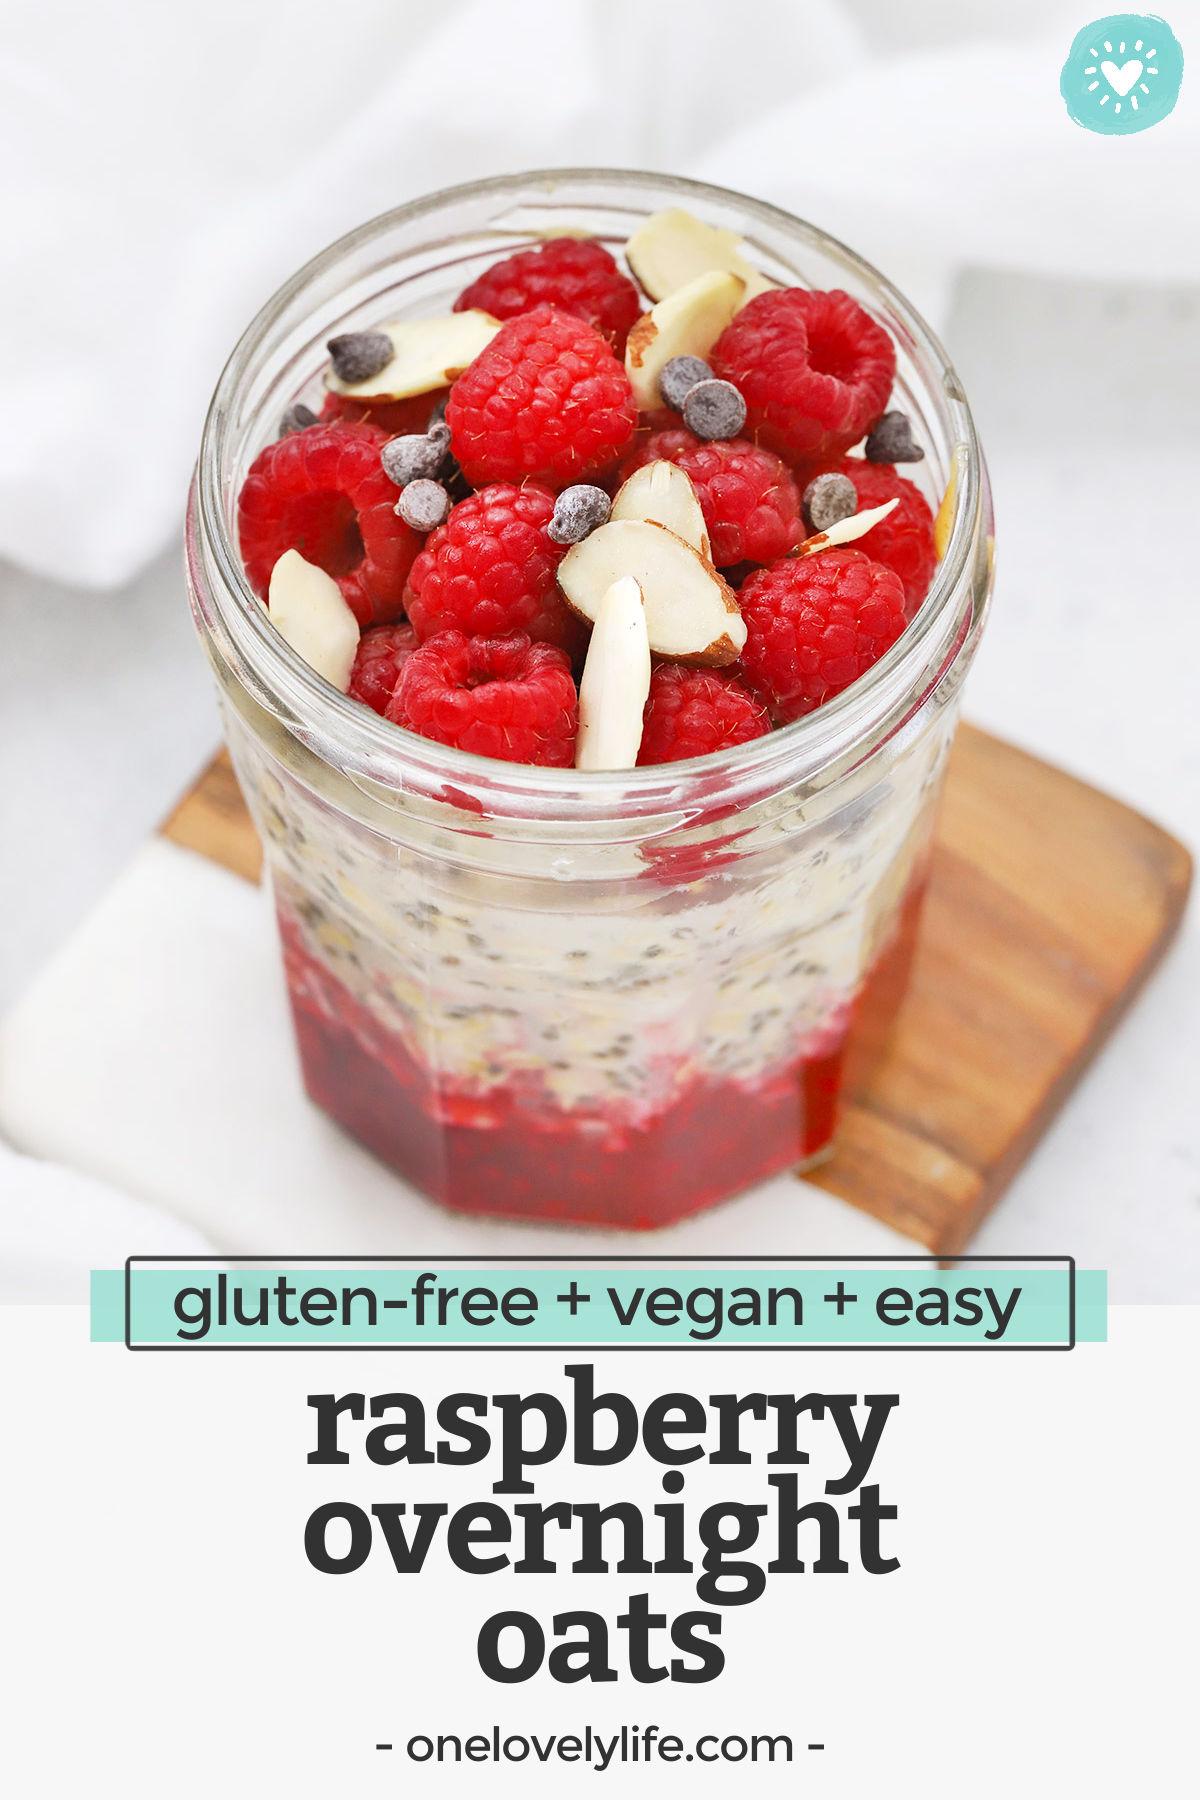 Raspberry Overnight Oats - An easy, delicious, healthy meal prep breakfast! // Raspberry Almond Overnight Oats // Raspberry Overnight Oats Recipe // Berry Overnight Oats // Vegan breakfast // healthy breakfast // gluten-free breakfast #overnightoats #oats #oatmeal #healthybreakfast #glutenfree #vegan